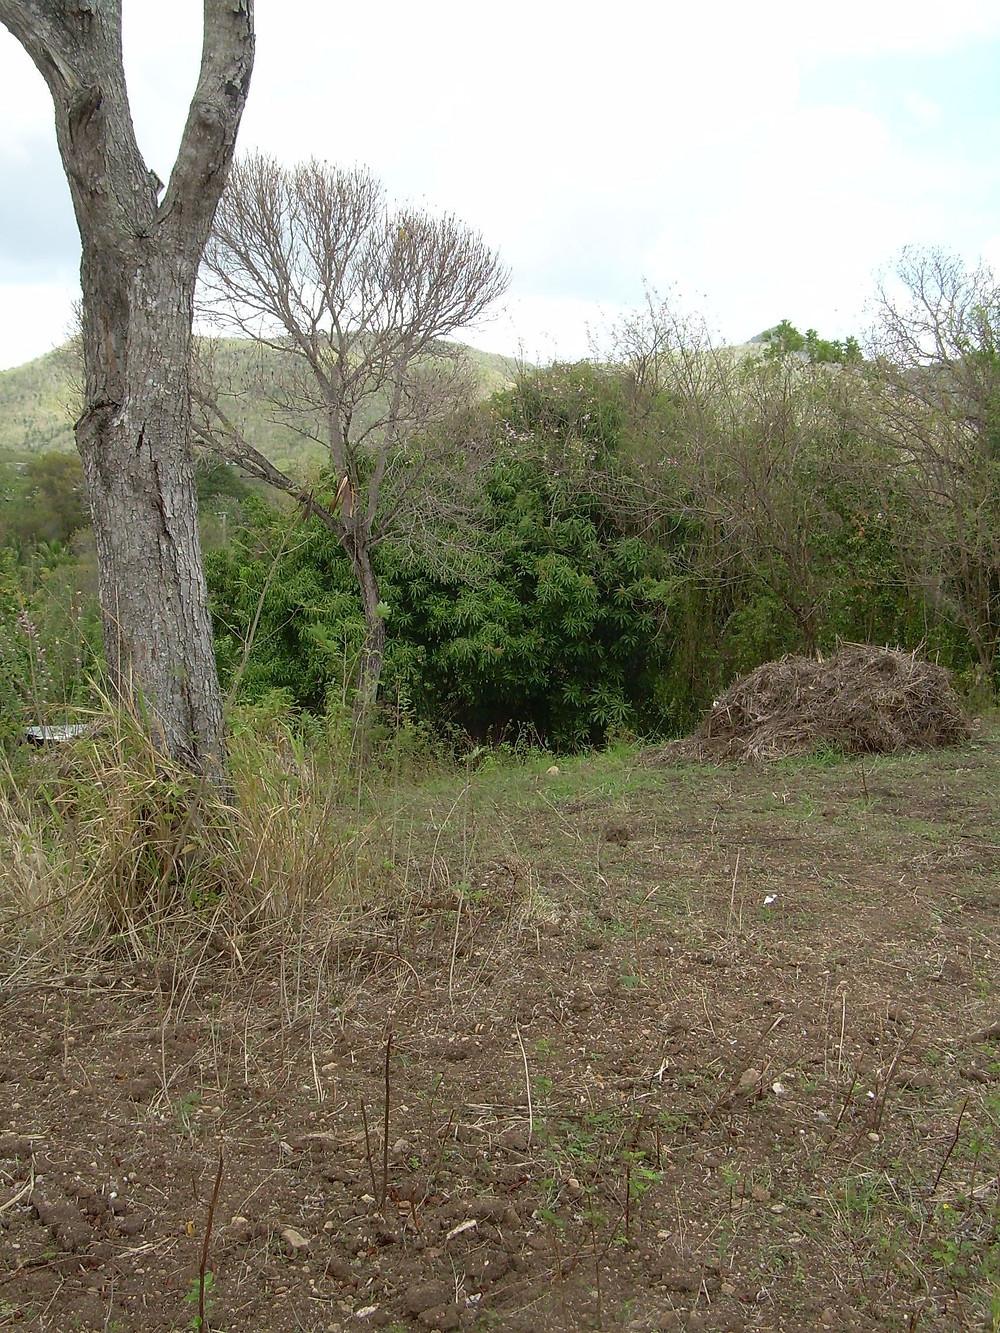 Le terrain avant la construction Janvier 2014 Location Pitaya